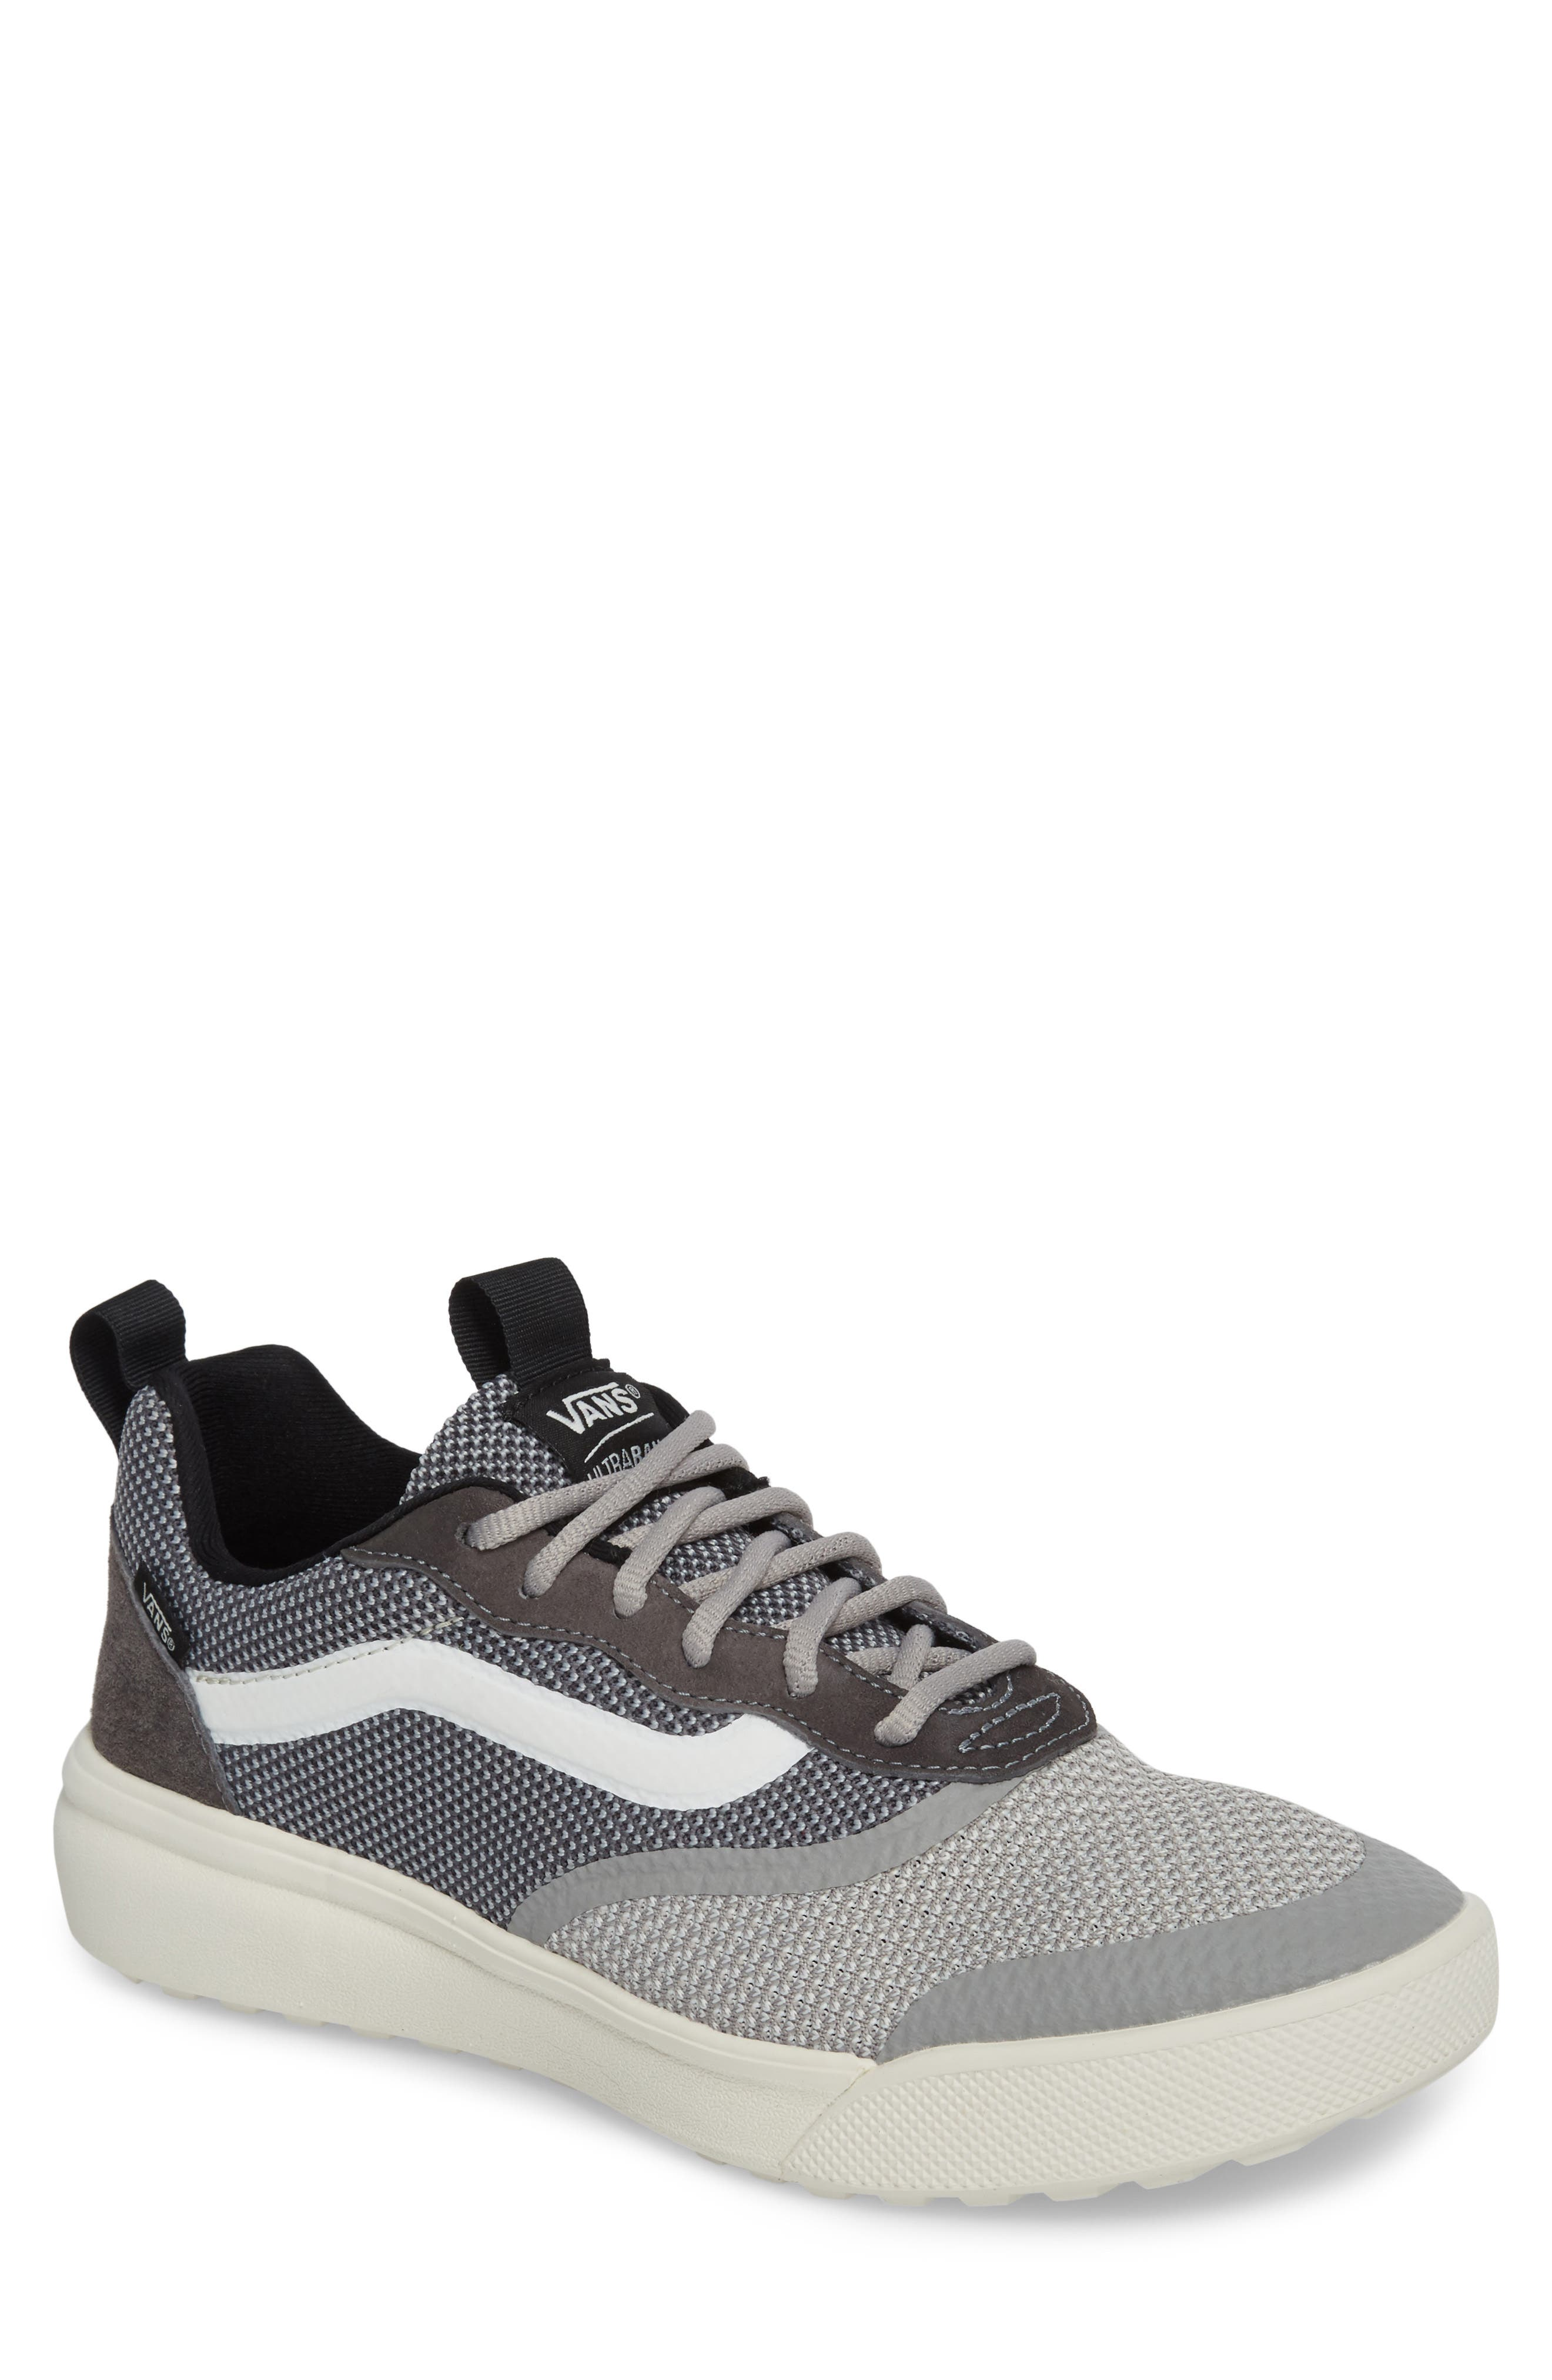 UltraRange DX Low Top Sneaker,                         Main,                         color, 021